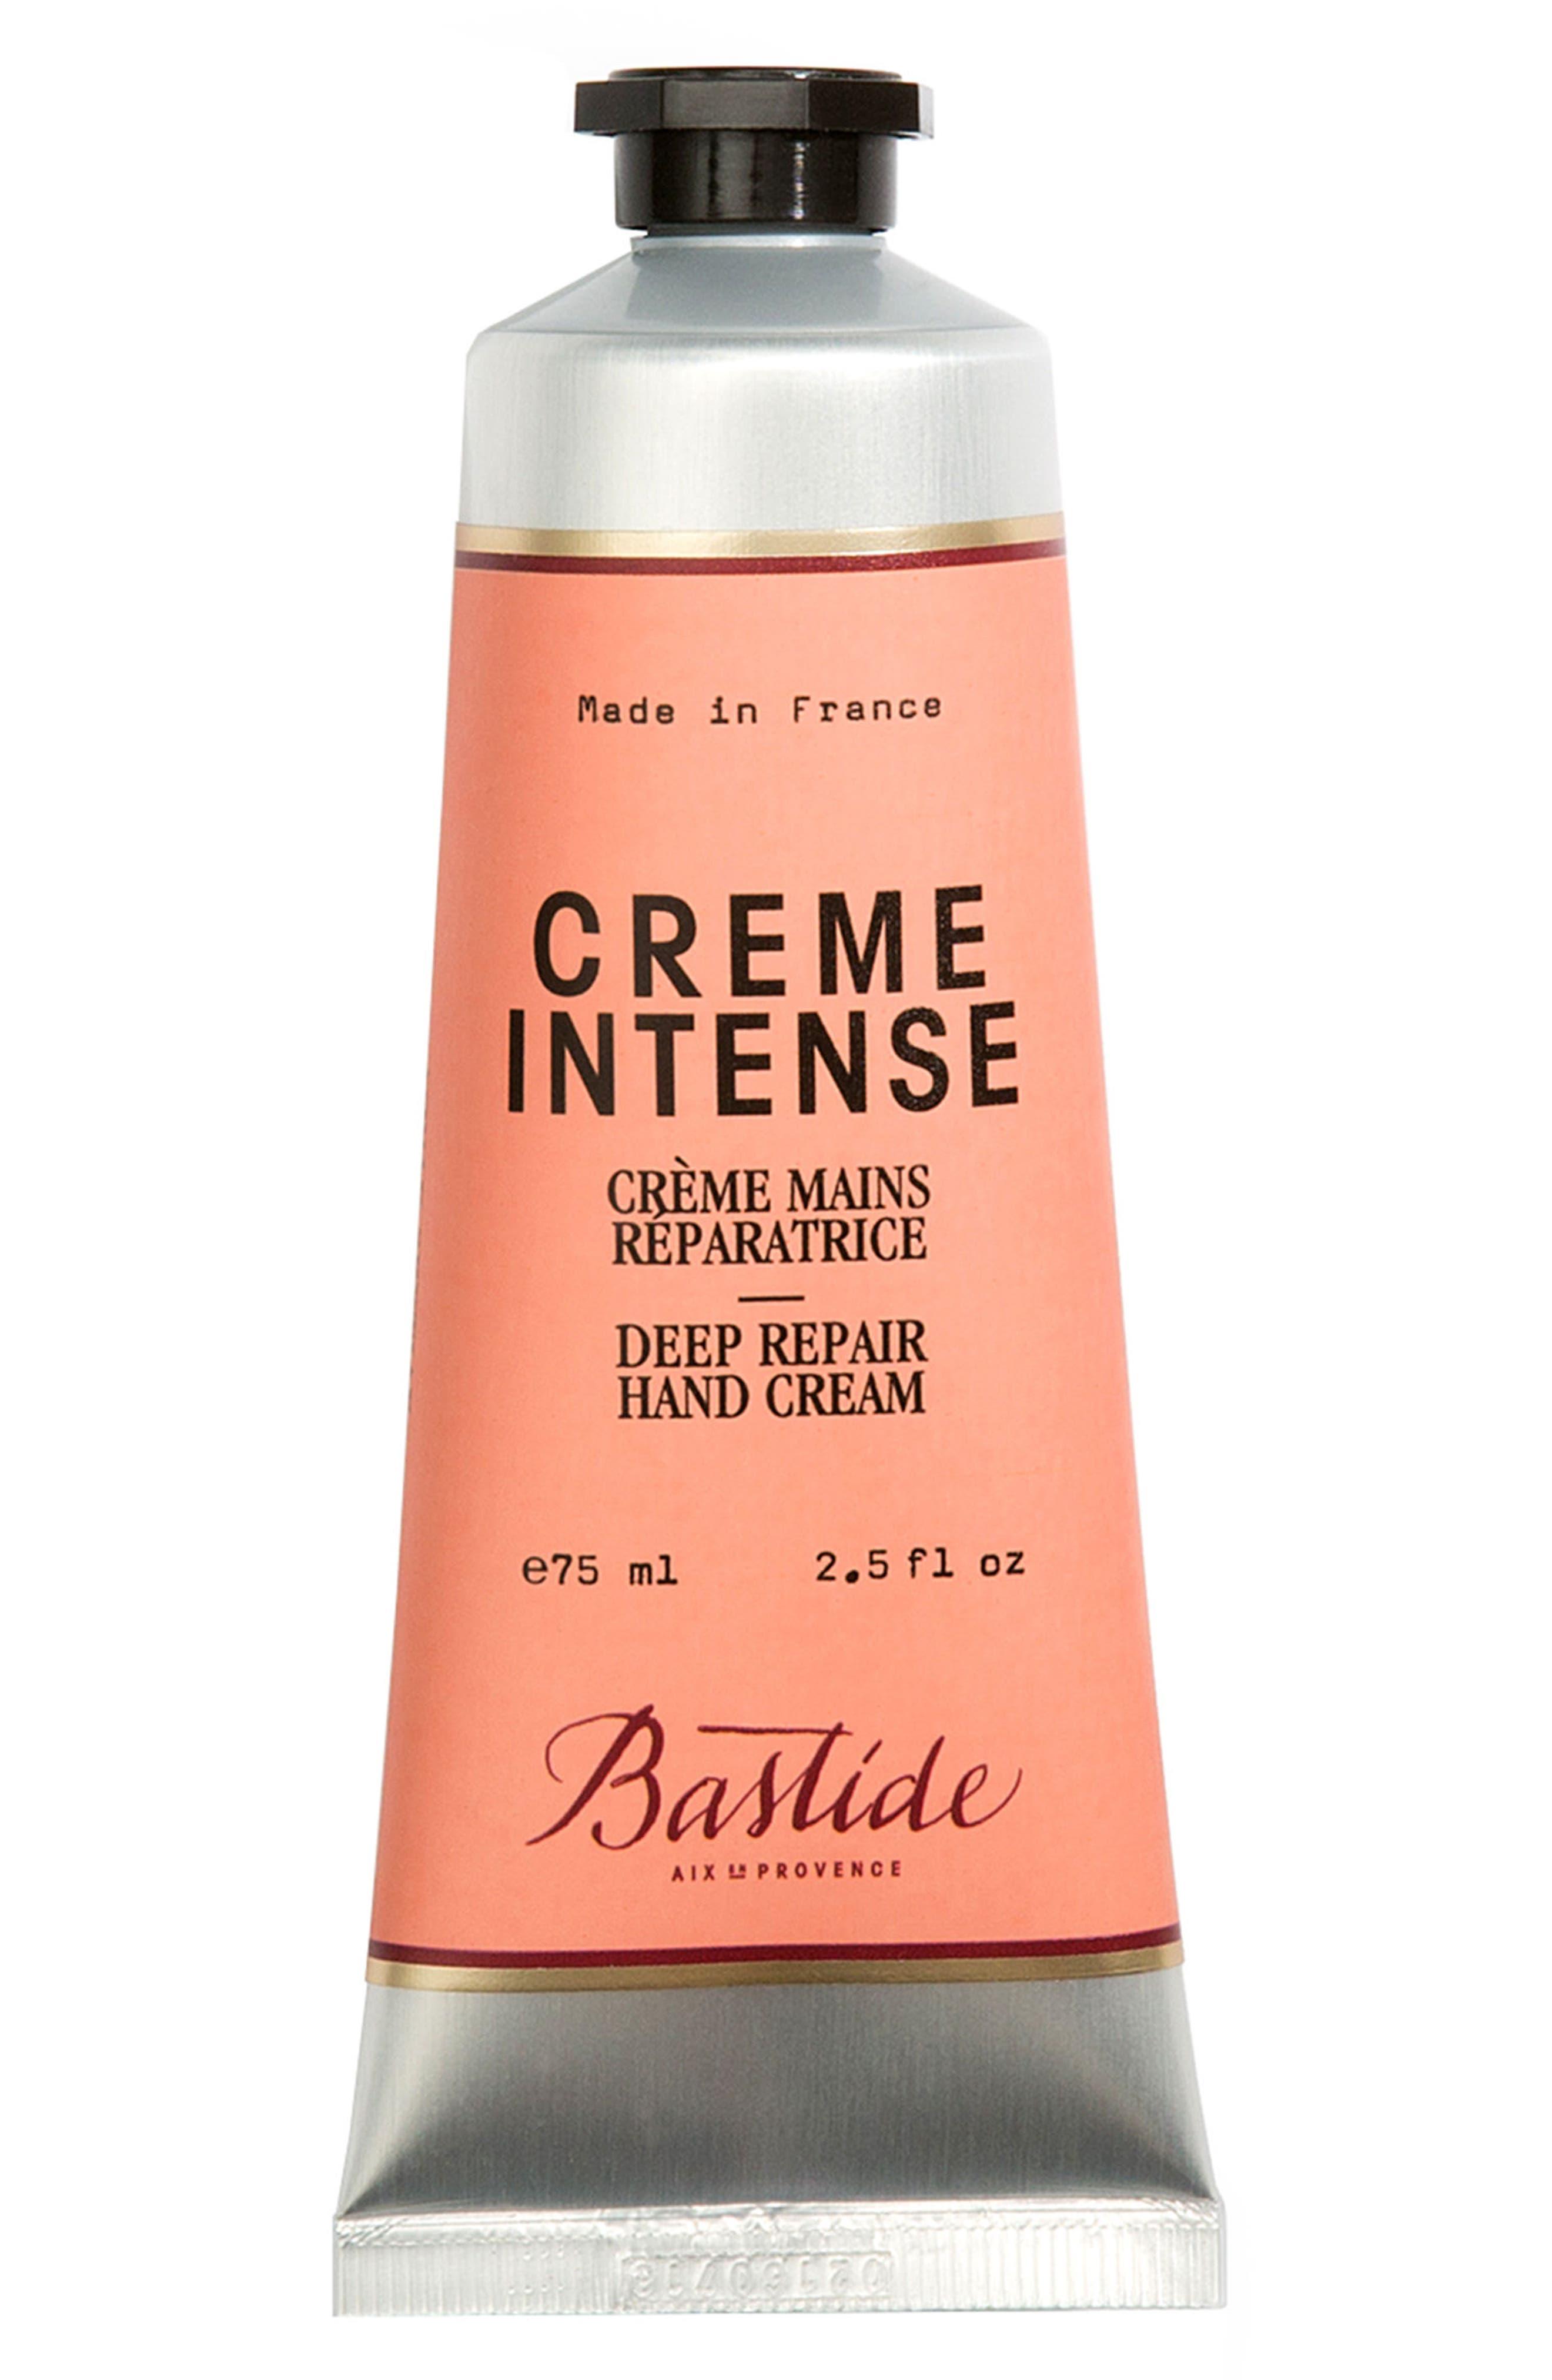 Main Image - Bastide Creme Intense Deep Repair Hand Cream